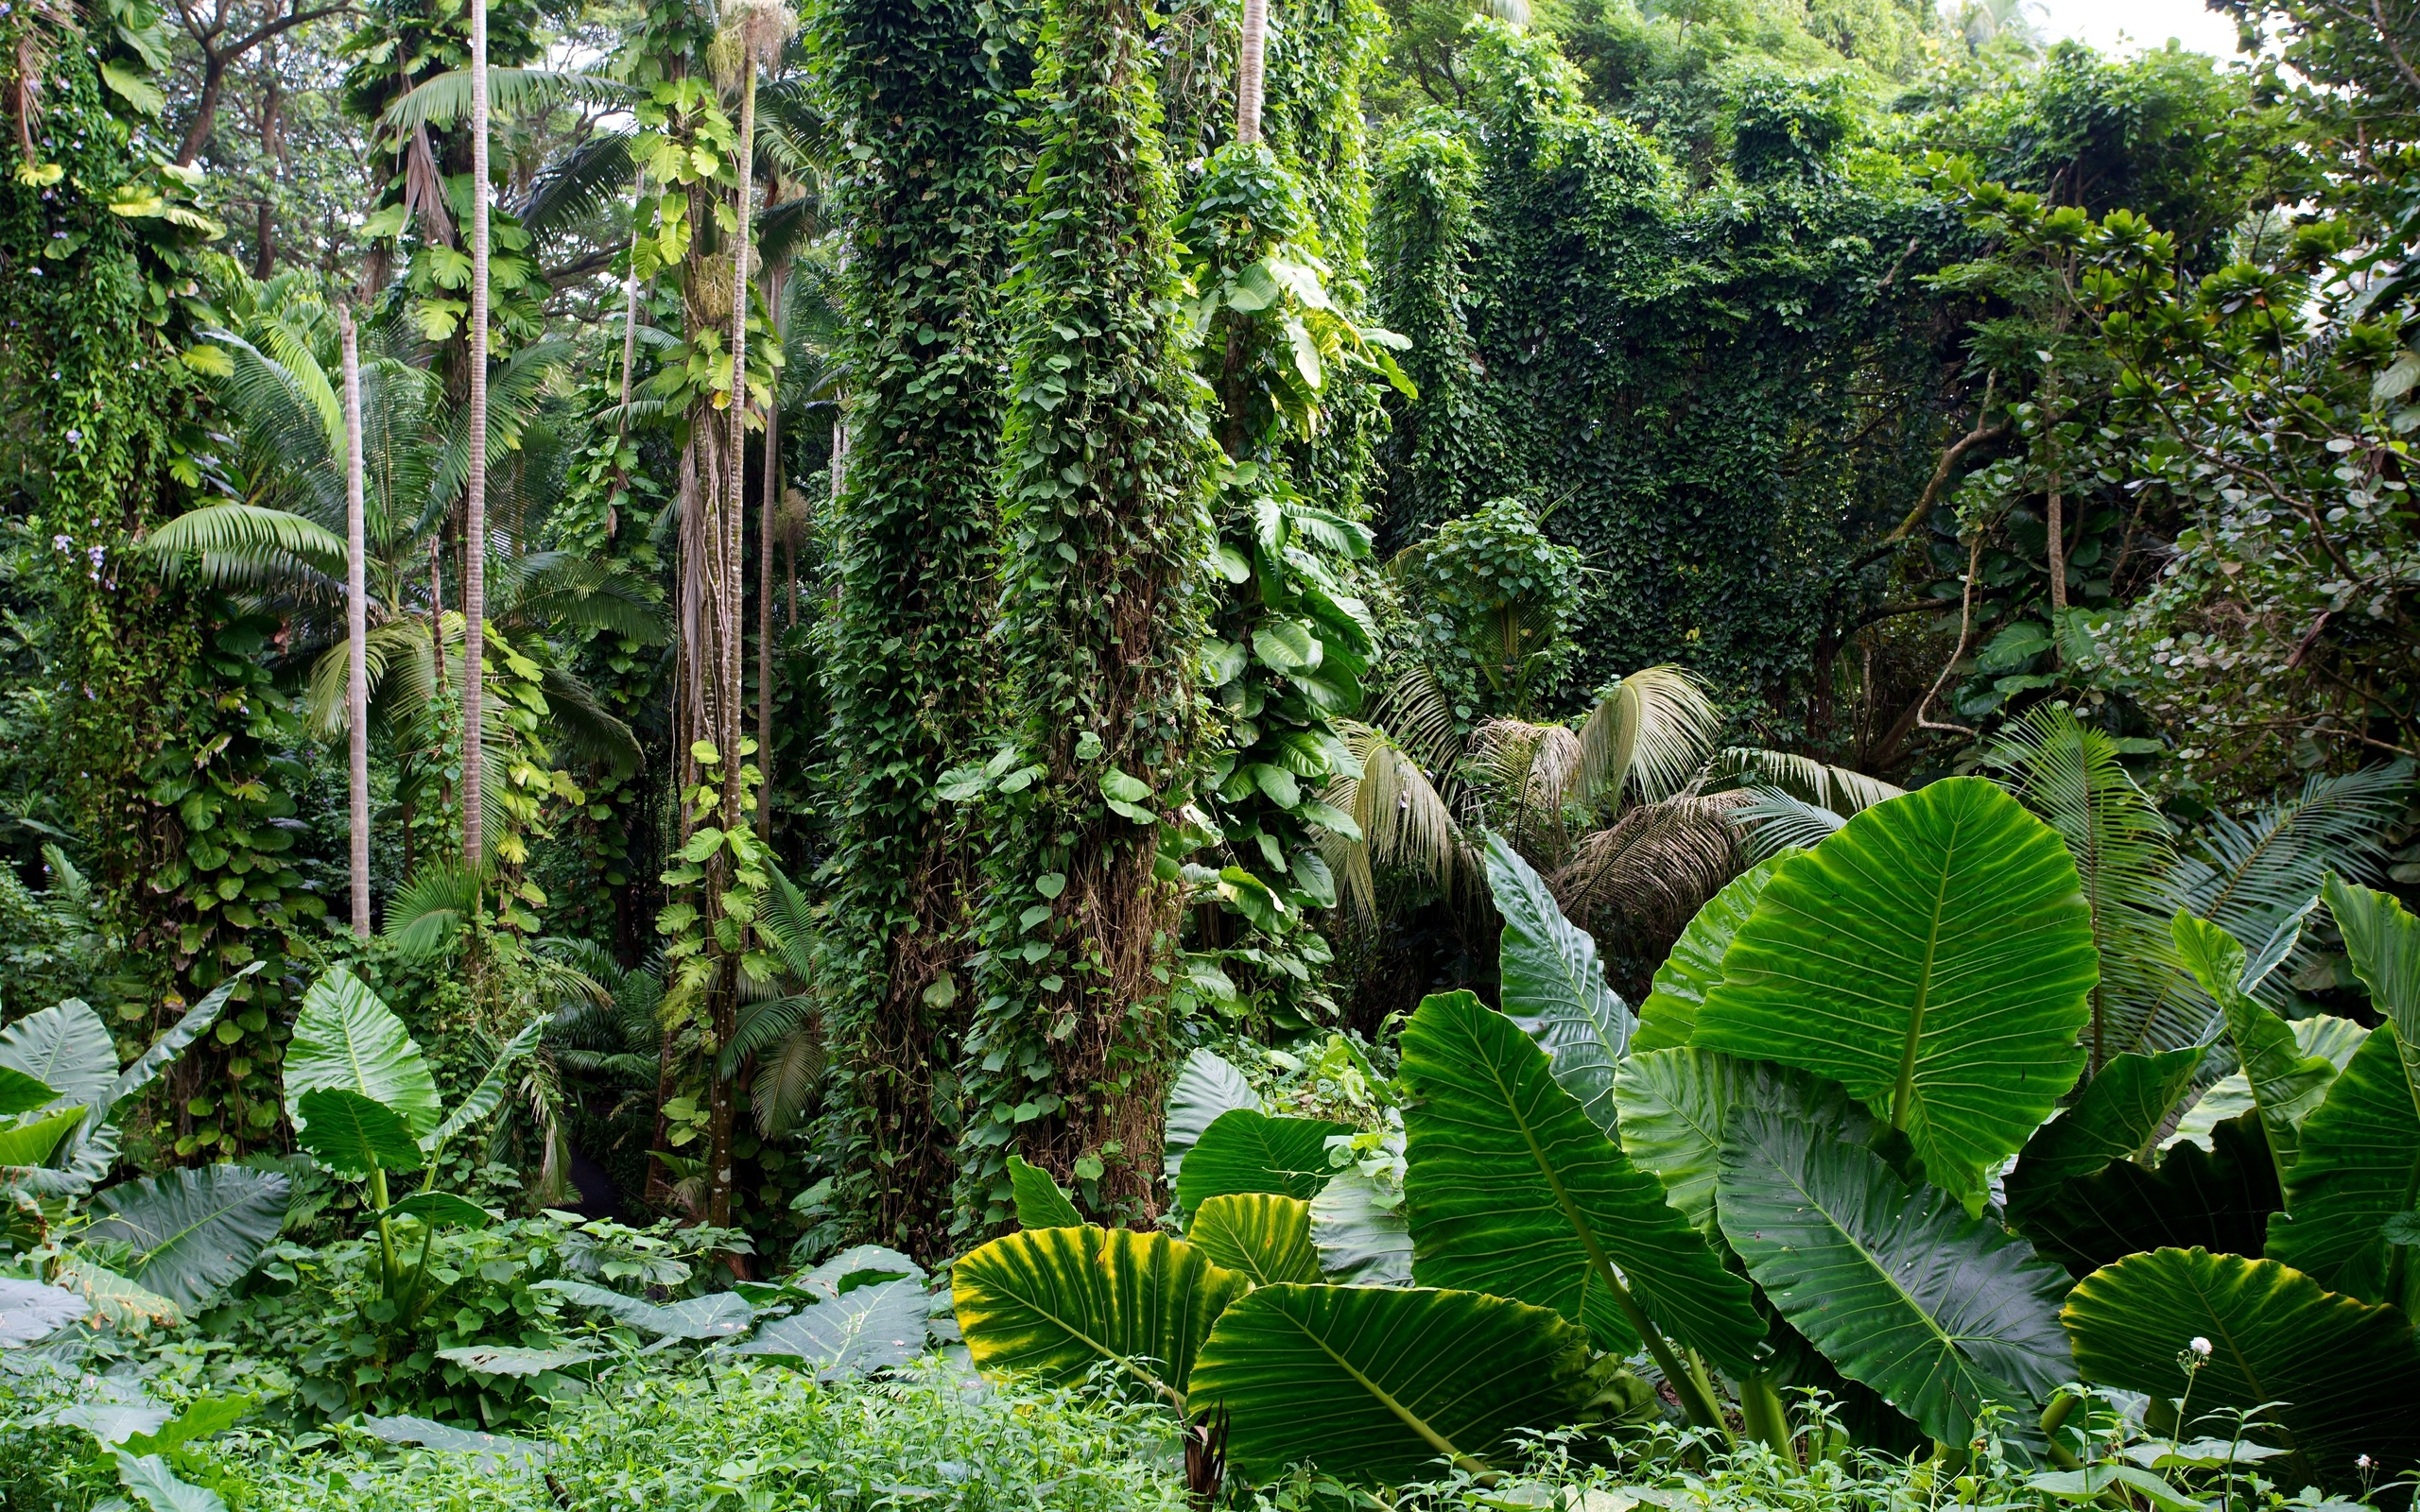 tropical jungle wallpaper - photo #27